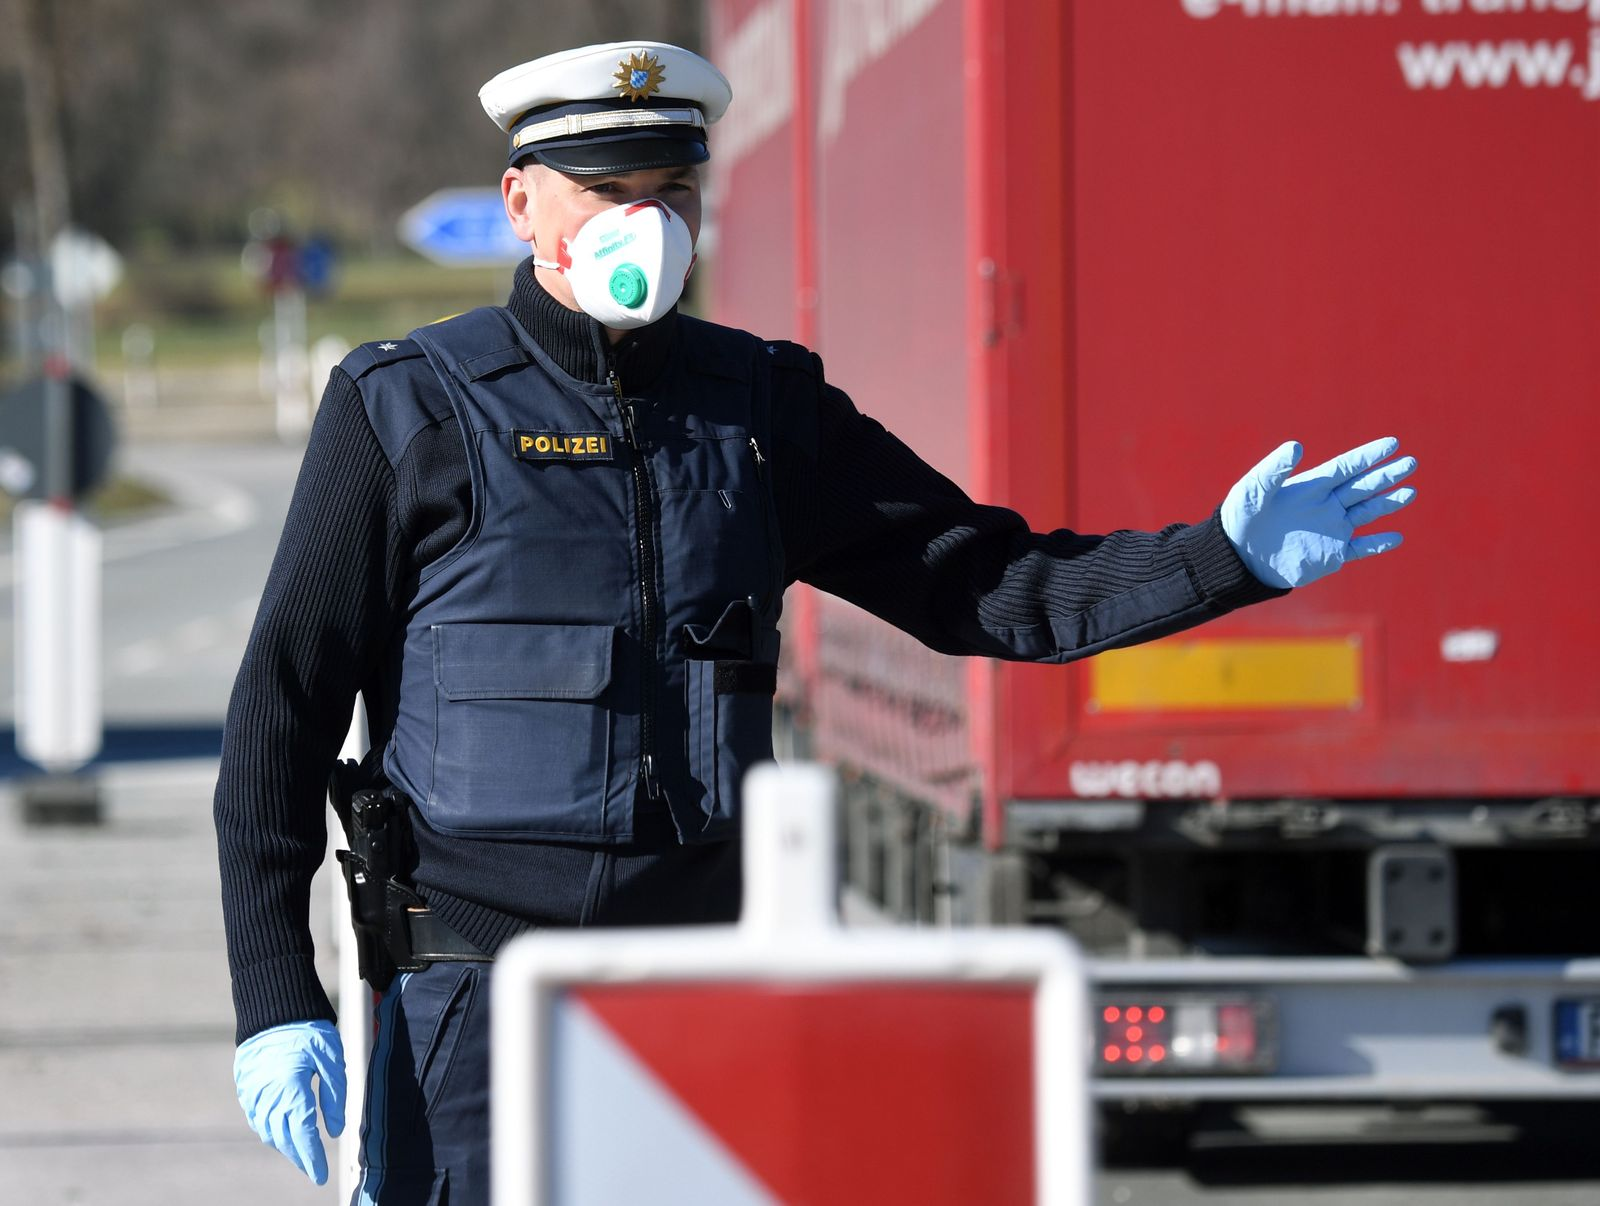 GERMANY-HEALTH-VIRUS-EPIDEMIC-POLICE